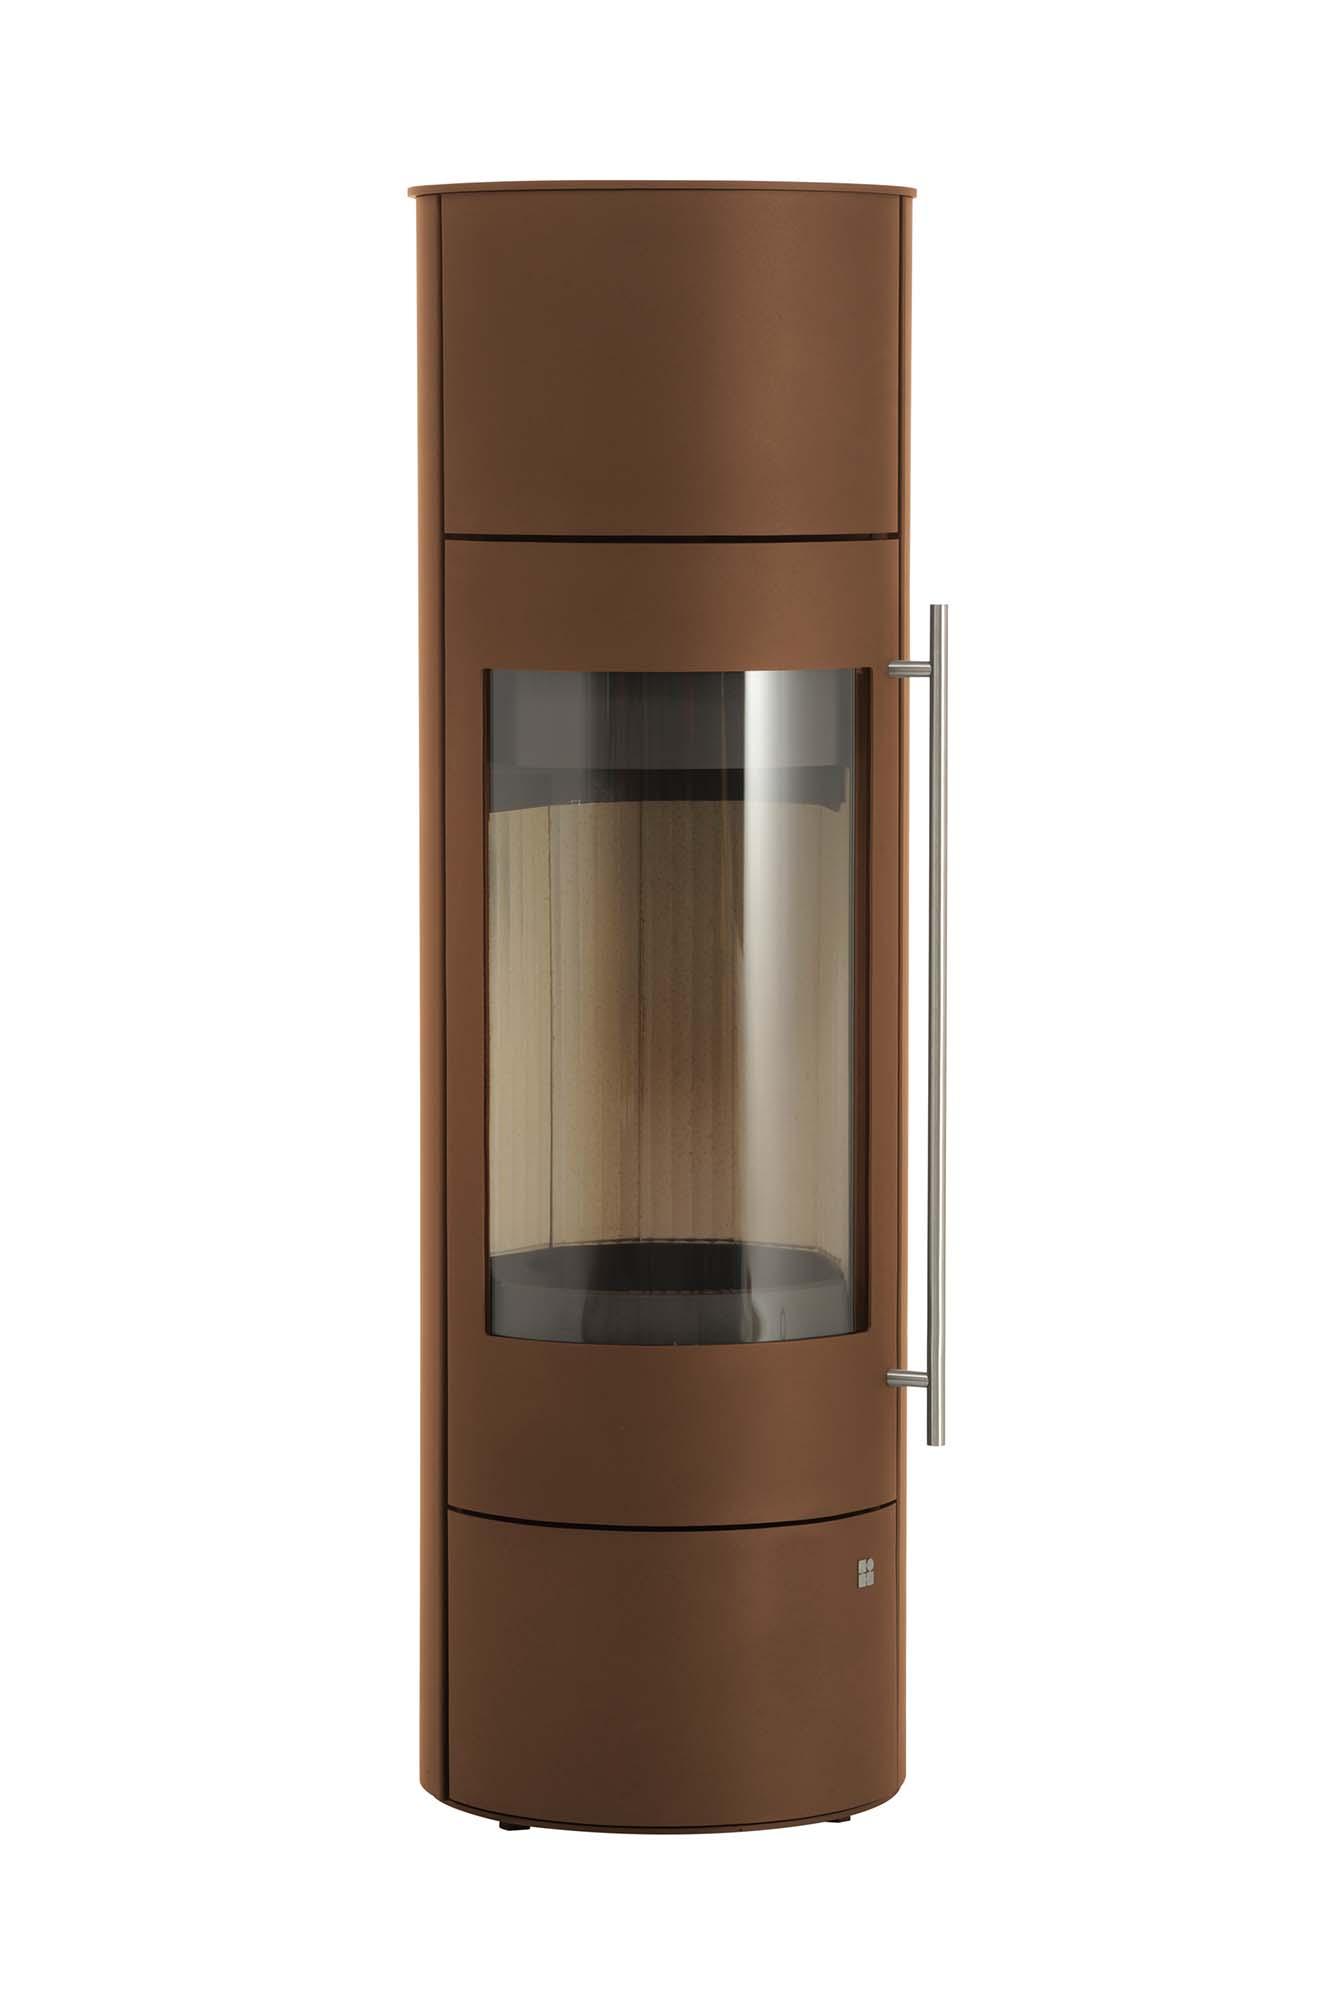 kaminofen olsberg palena powerbloc compact 5 kw kaufen. Black Bedroom Furniture Sets. Home Design Ideas